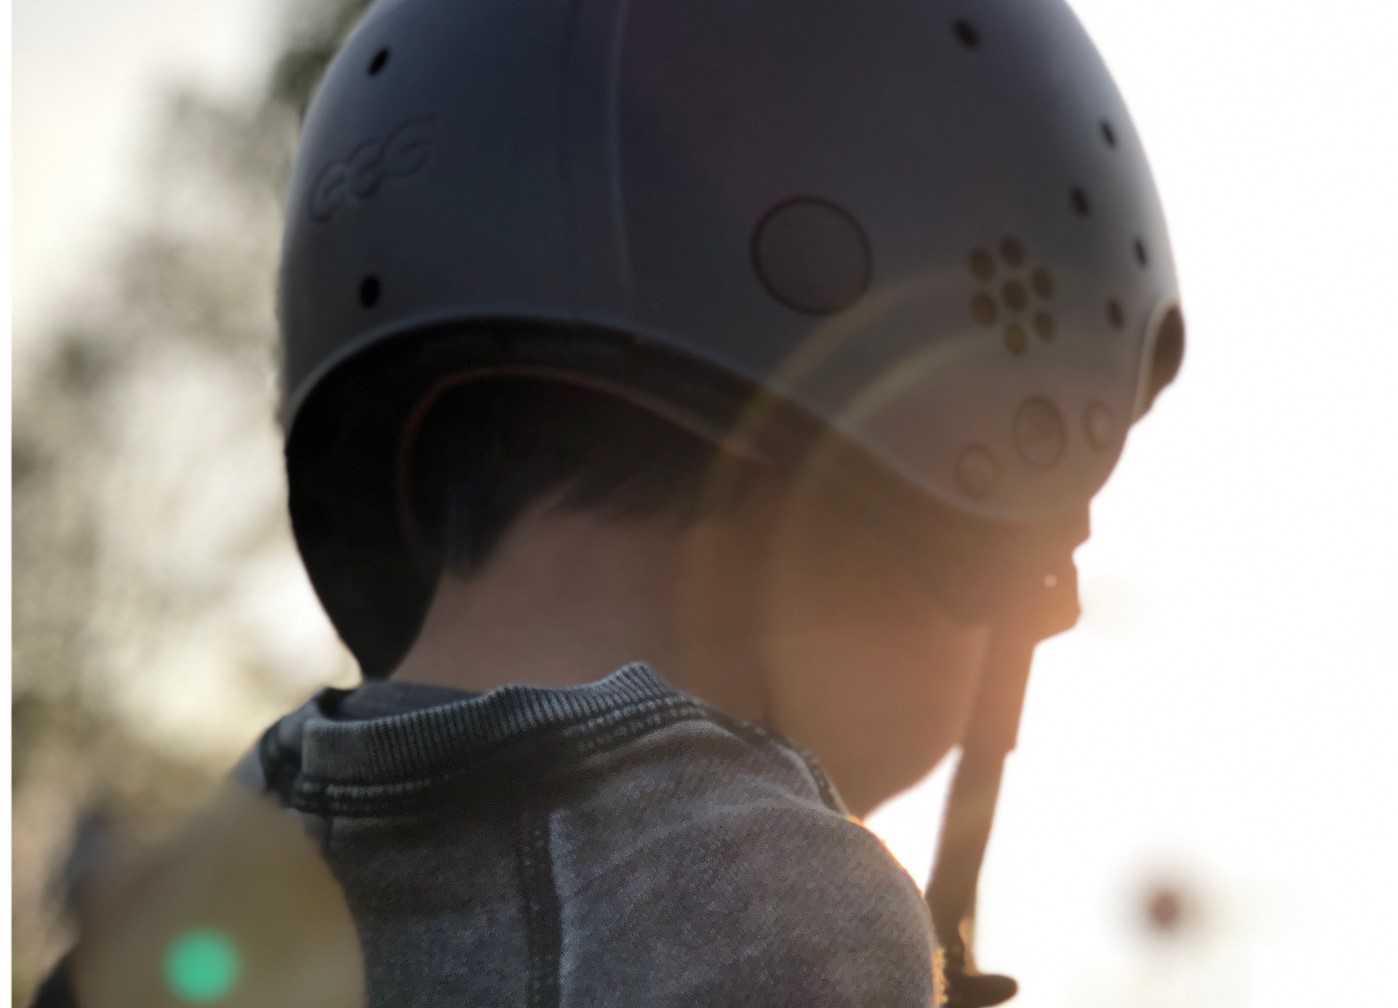 Kid Wearing Helmet | Goodwill Car Donations